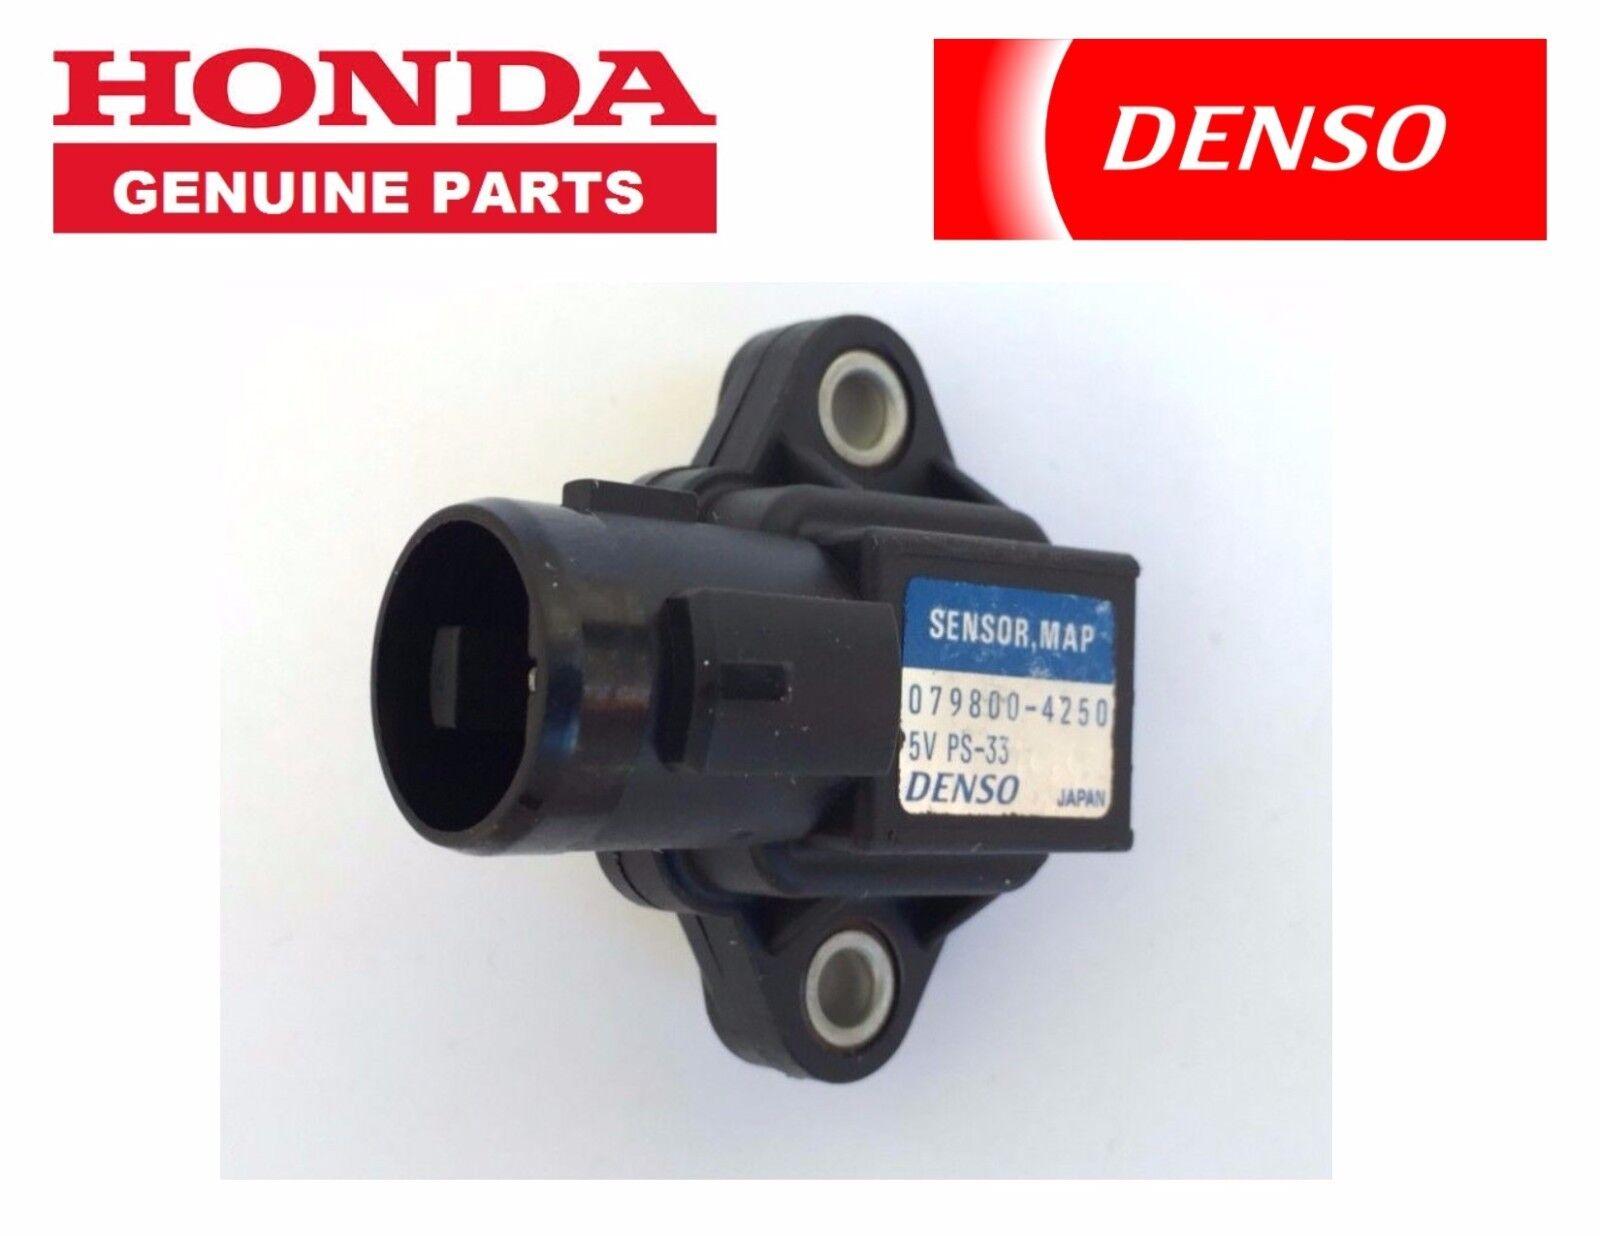 Hot Sale Manifold Air Pressure Sensor Honda Acura 079800